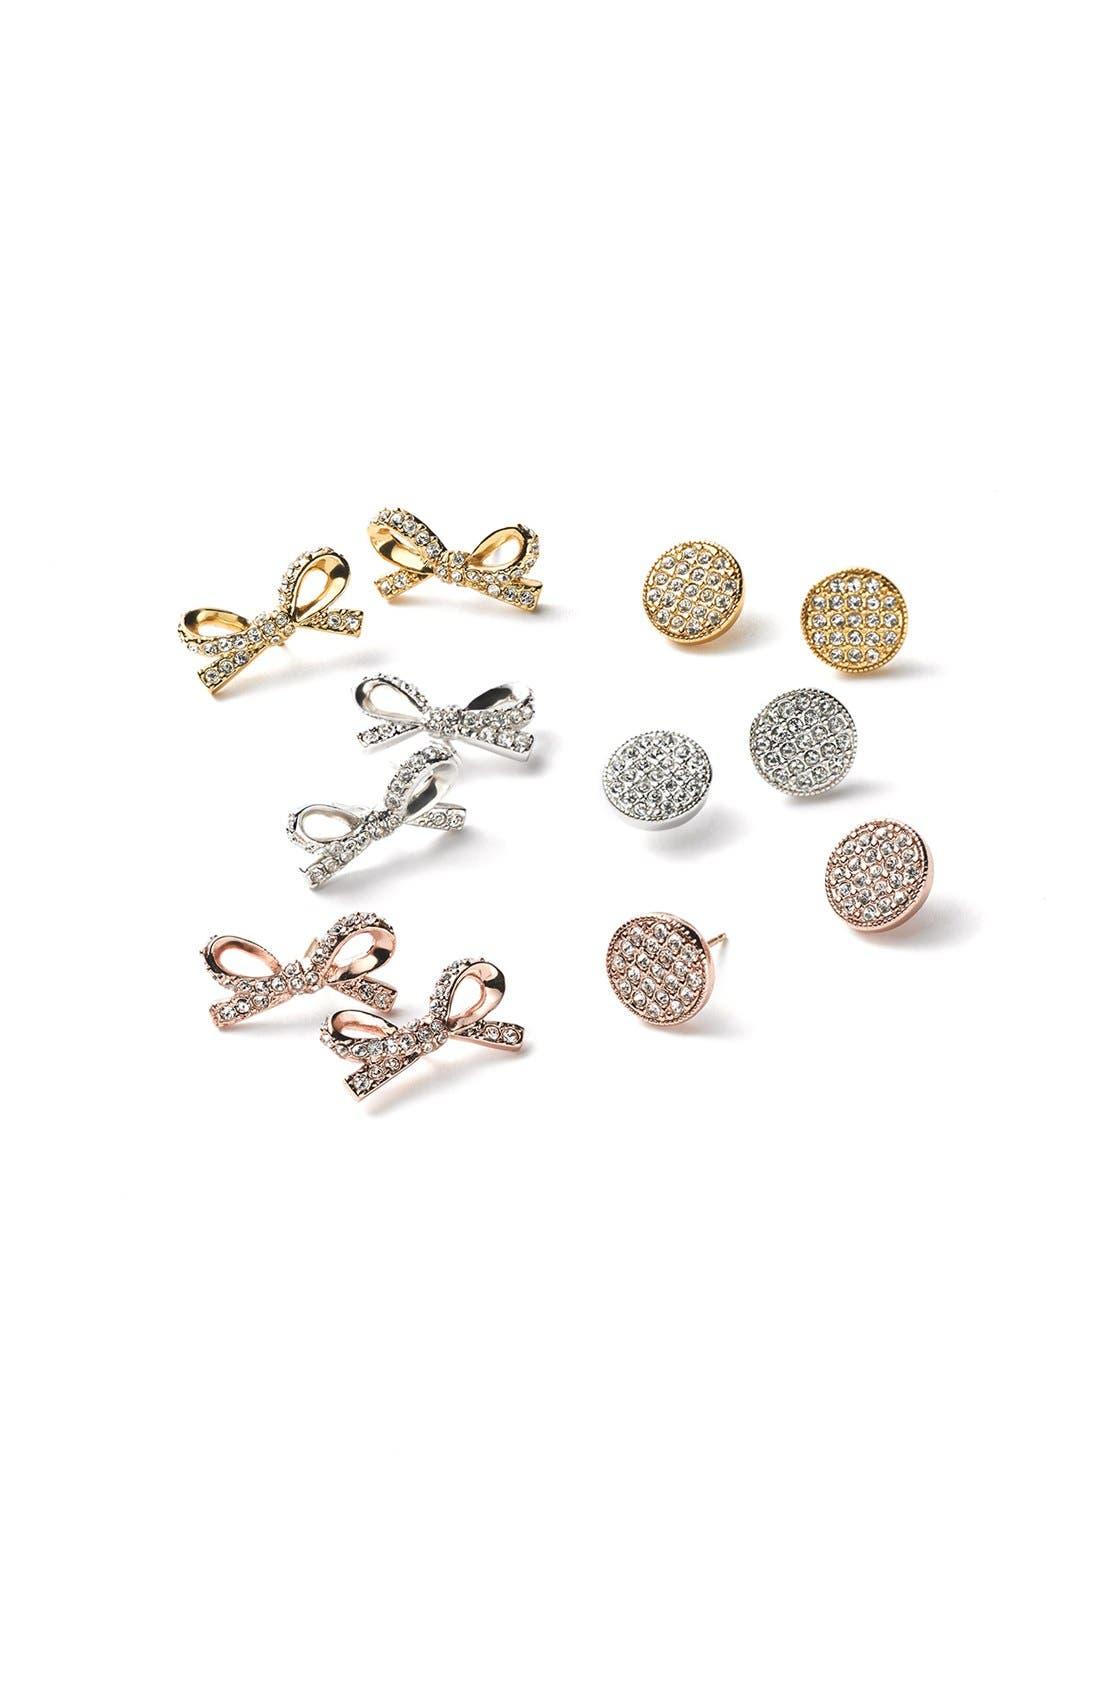 KATE SPADE NEW YORK, 'skinny mini' bow stud earrings, Alternate thumbnail 2, color, 040